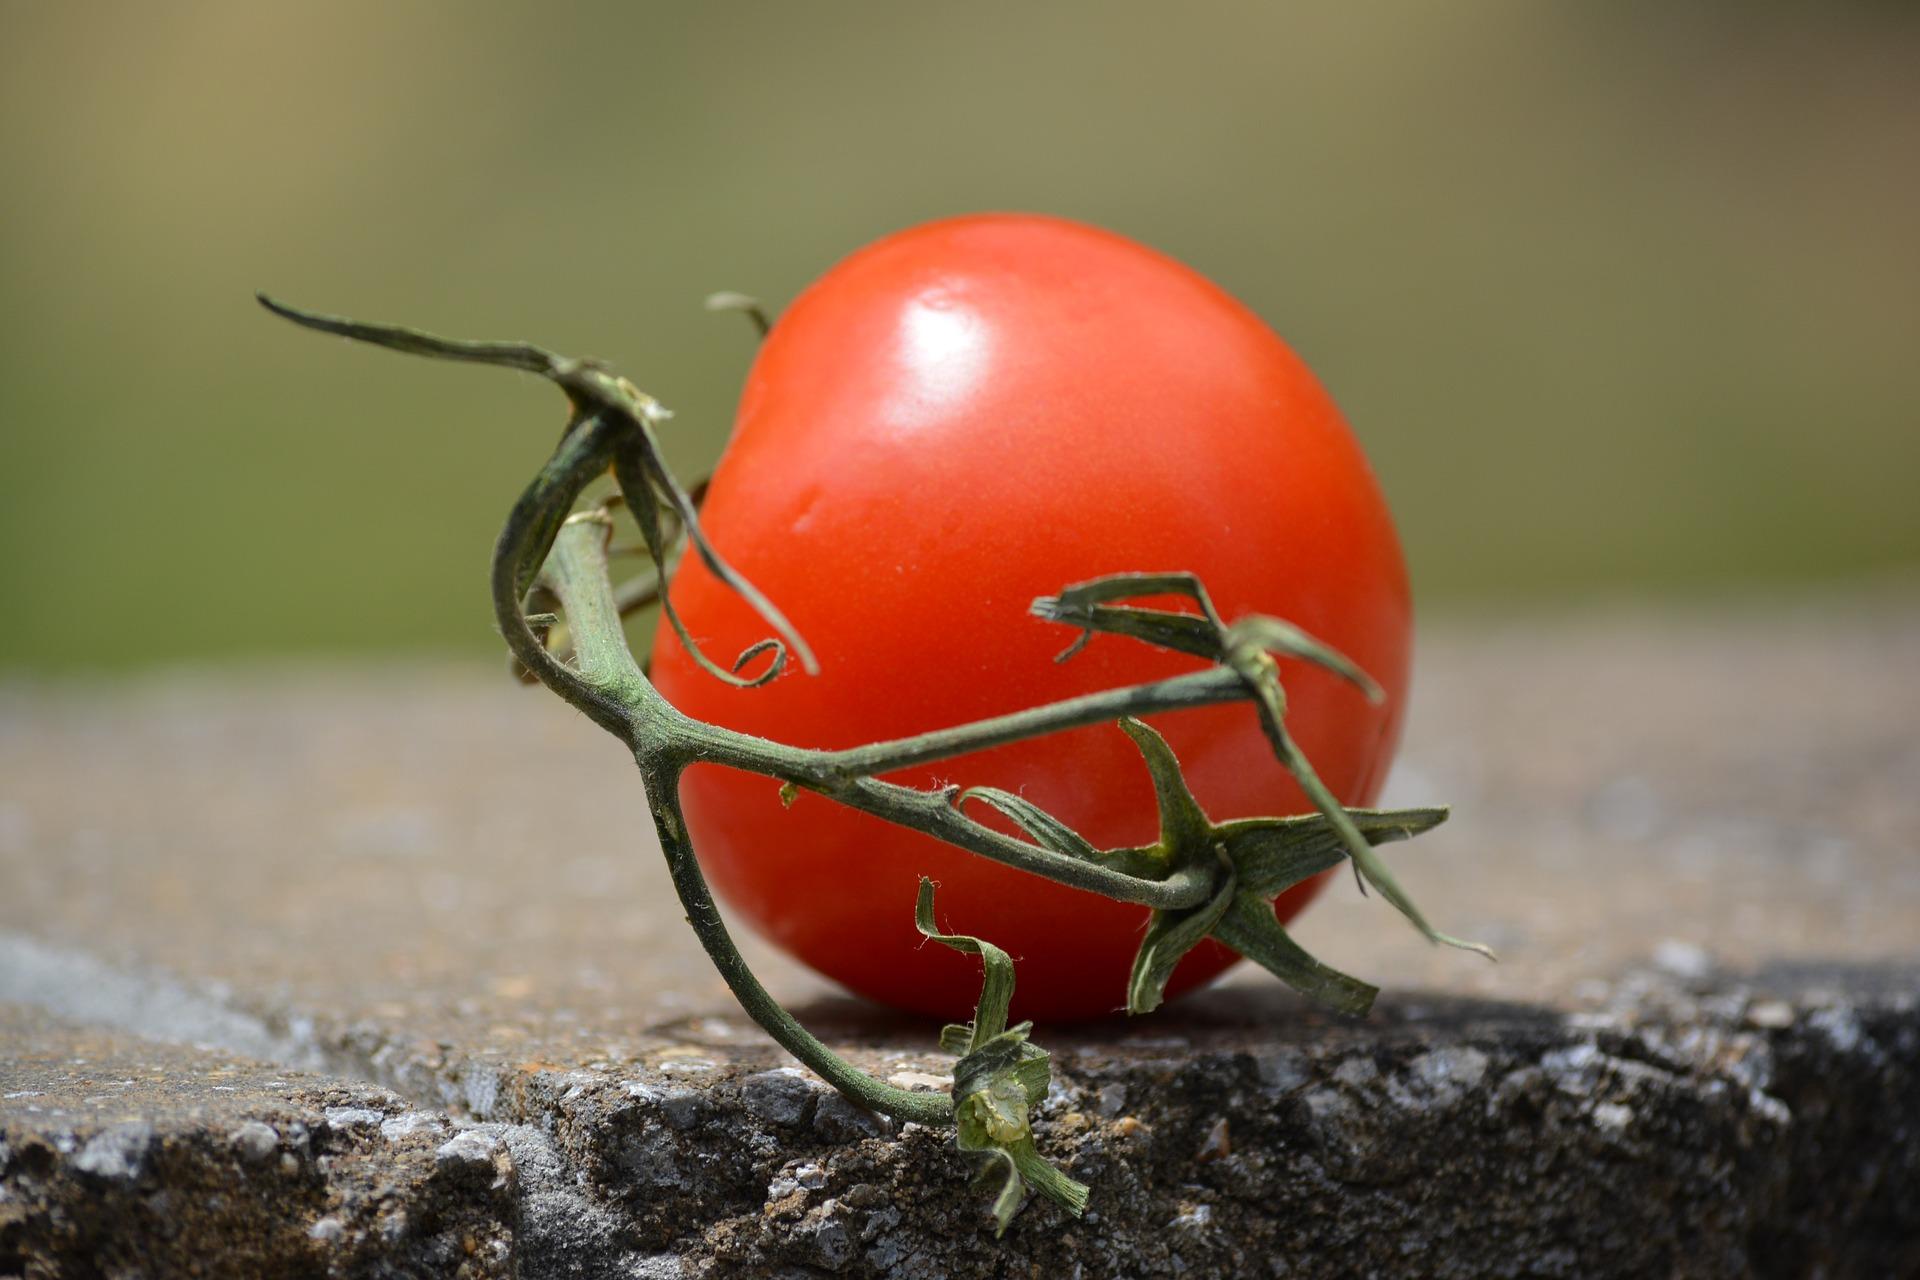 Pomidor o smaku czekolady?